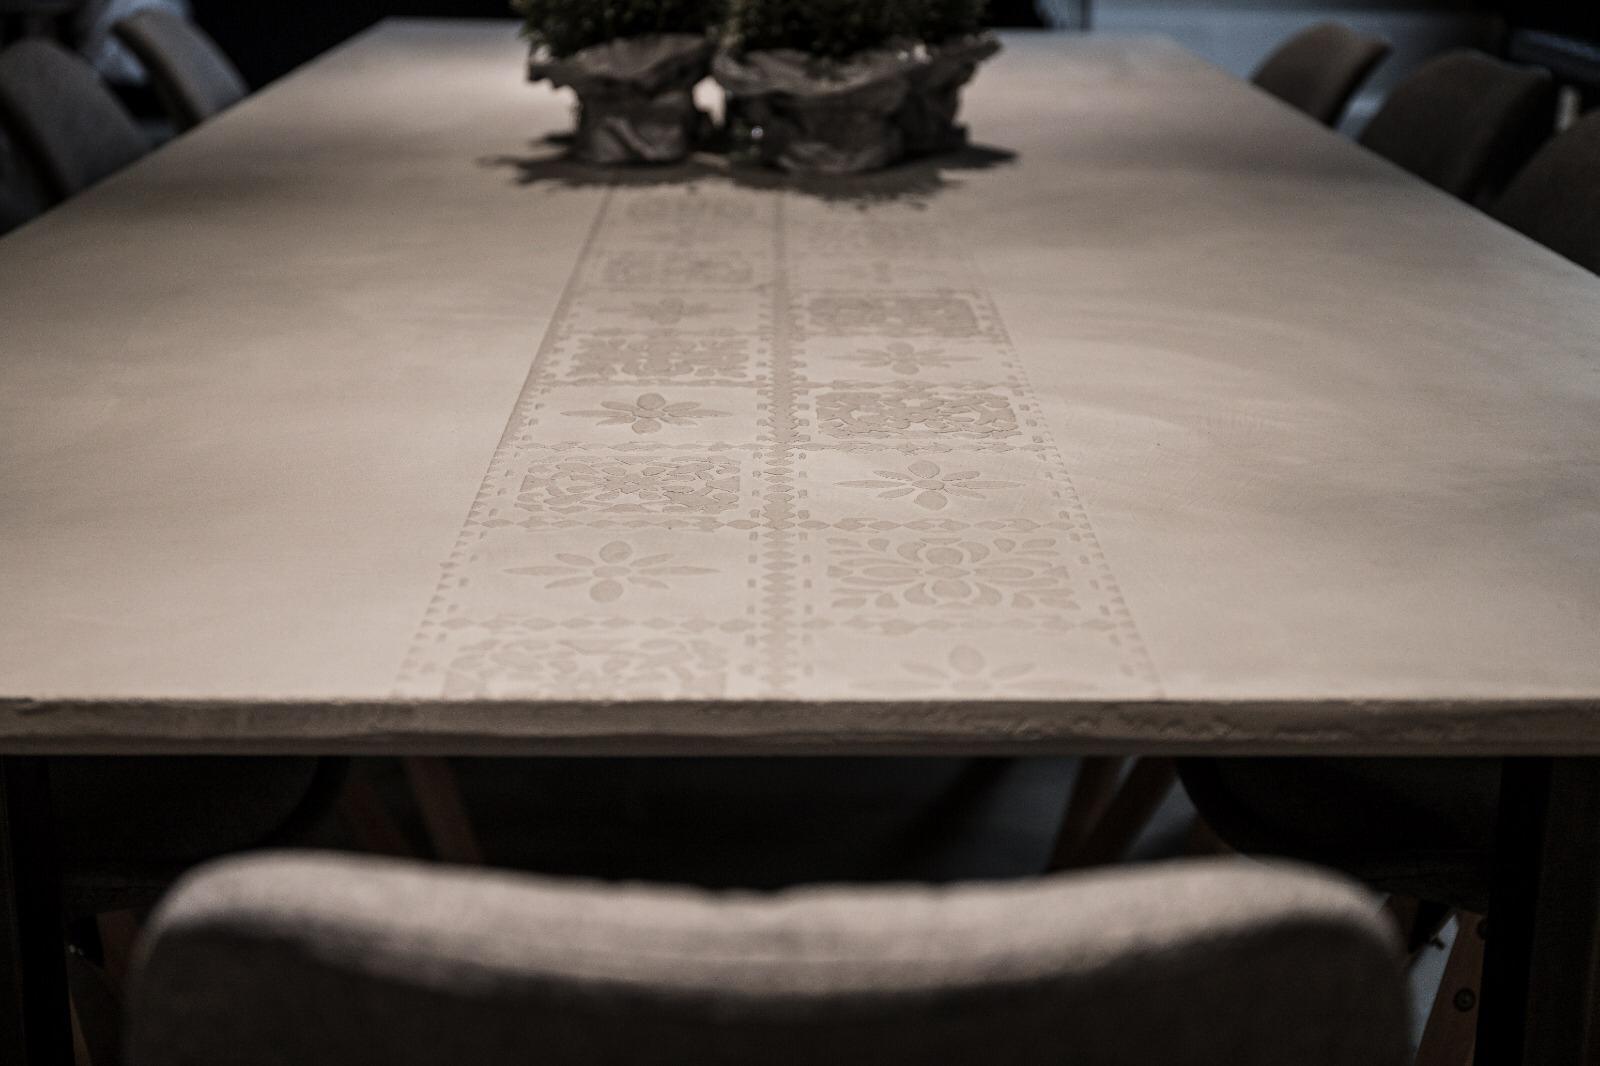 Beschichtung der Tischplatte